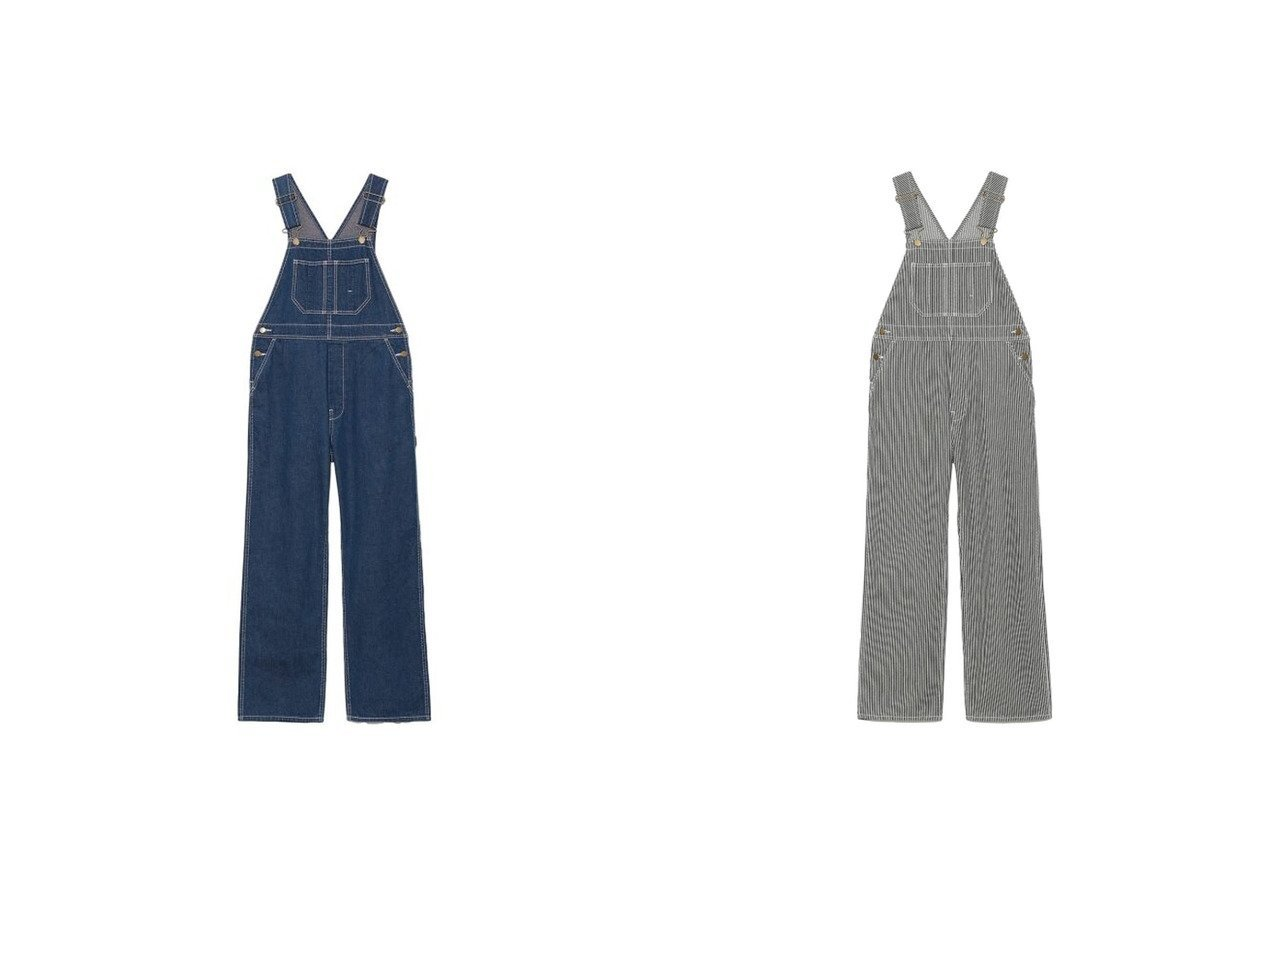 【Mila Owen/ミラオーウェン】のオーバーオール 【ワンピース・ドレス】おすすめ!人気、トレンド・レディースファッションの通販  おすすめで人気の流行・トレンド、ファッションの通販商品 インテリア・家具・メンズファッション・キッズファッション・レディースファッション・服の通販 founy(ファニー) https://founy.com/ ファッション Fashion レディースファッション WOMEN 2021年 2021 2021春夏・S/S SS/Spring/Summer/2021 S/S・春夏 SS・Spring/Summer ストライプ スマート デニム ファブリック メンズ 夏 Summer 日本製 Made in Japan 春 Spring  ID:crp329100000049281